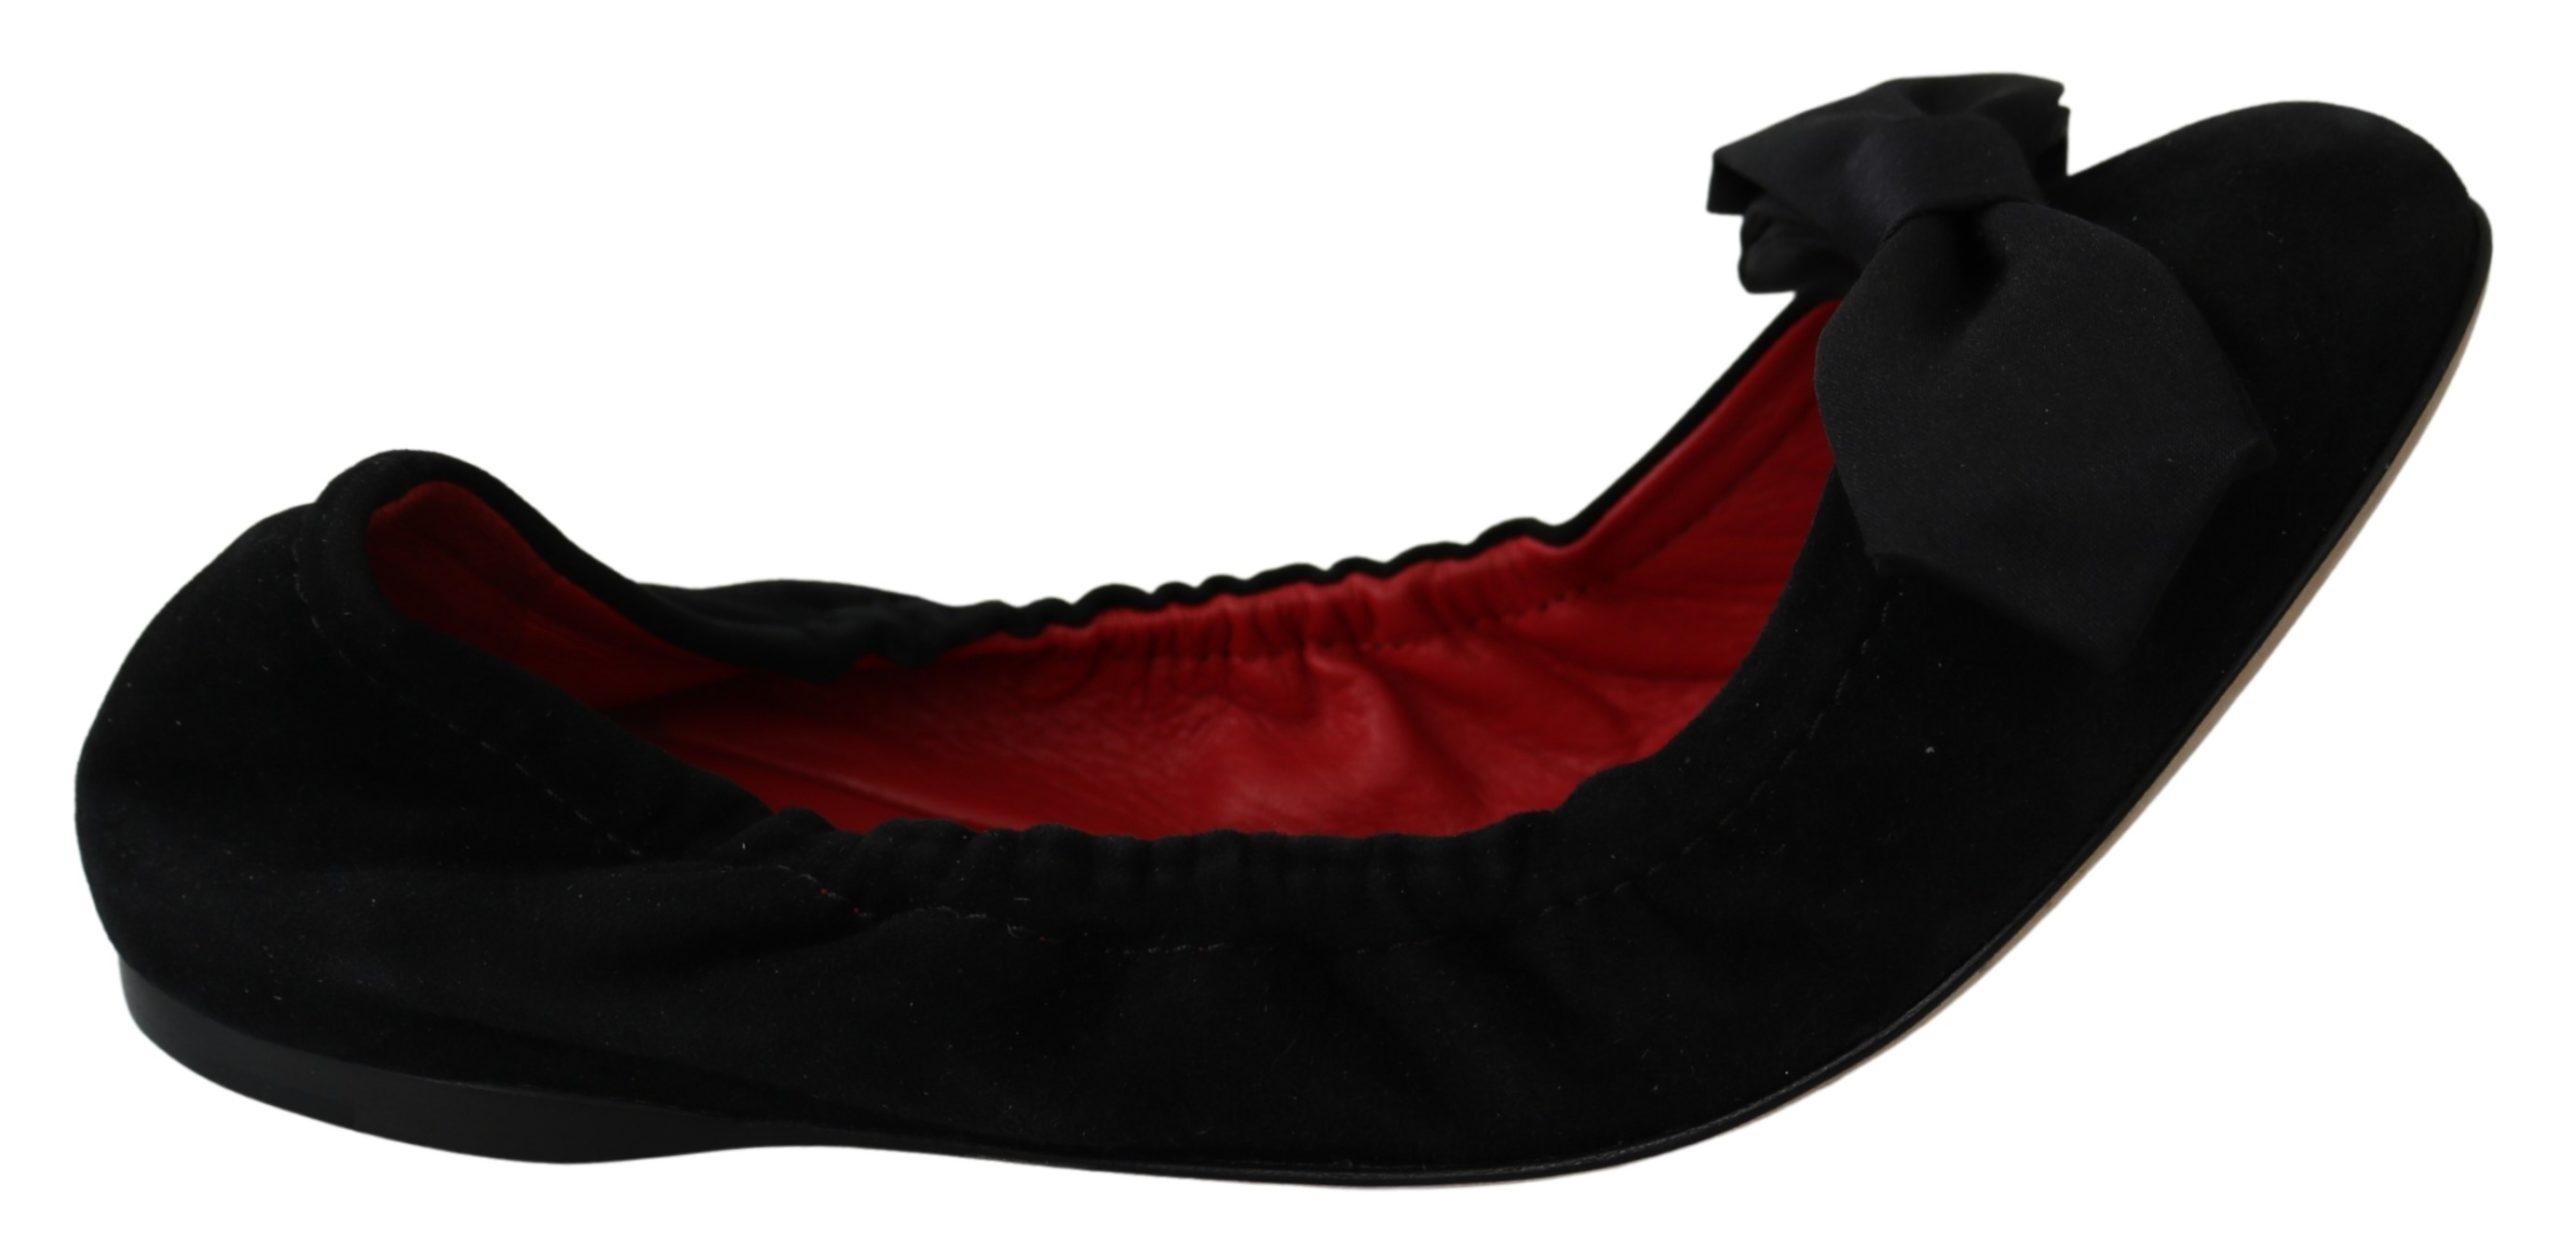 Black Suede Red Ballerina Flats Shoes - EU39/US8.5